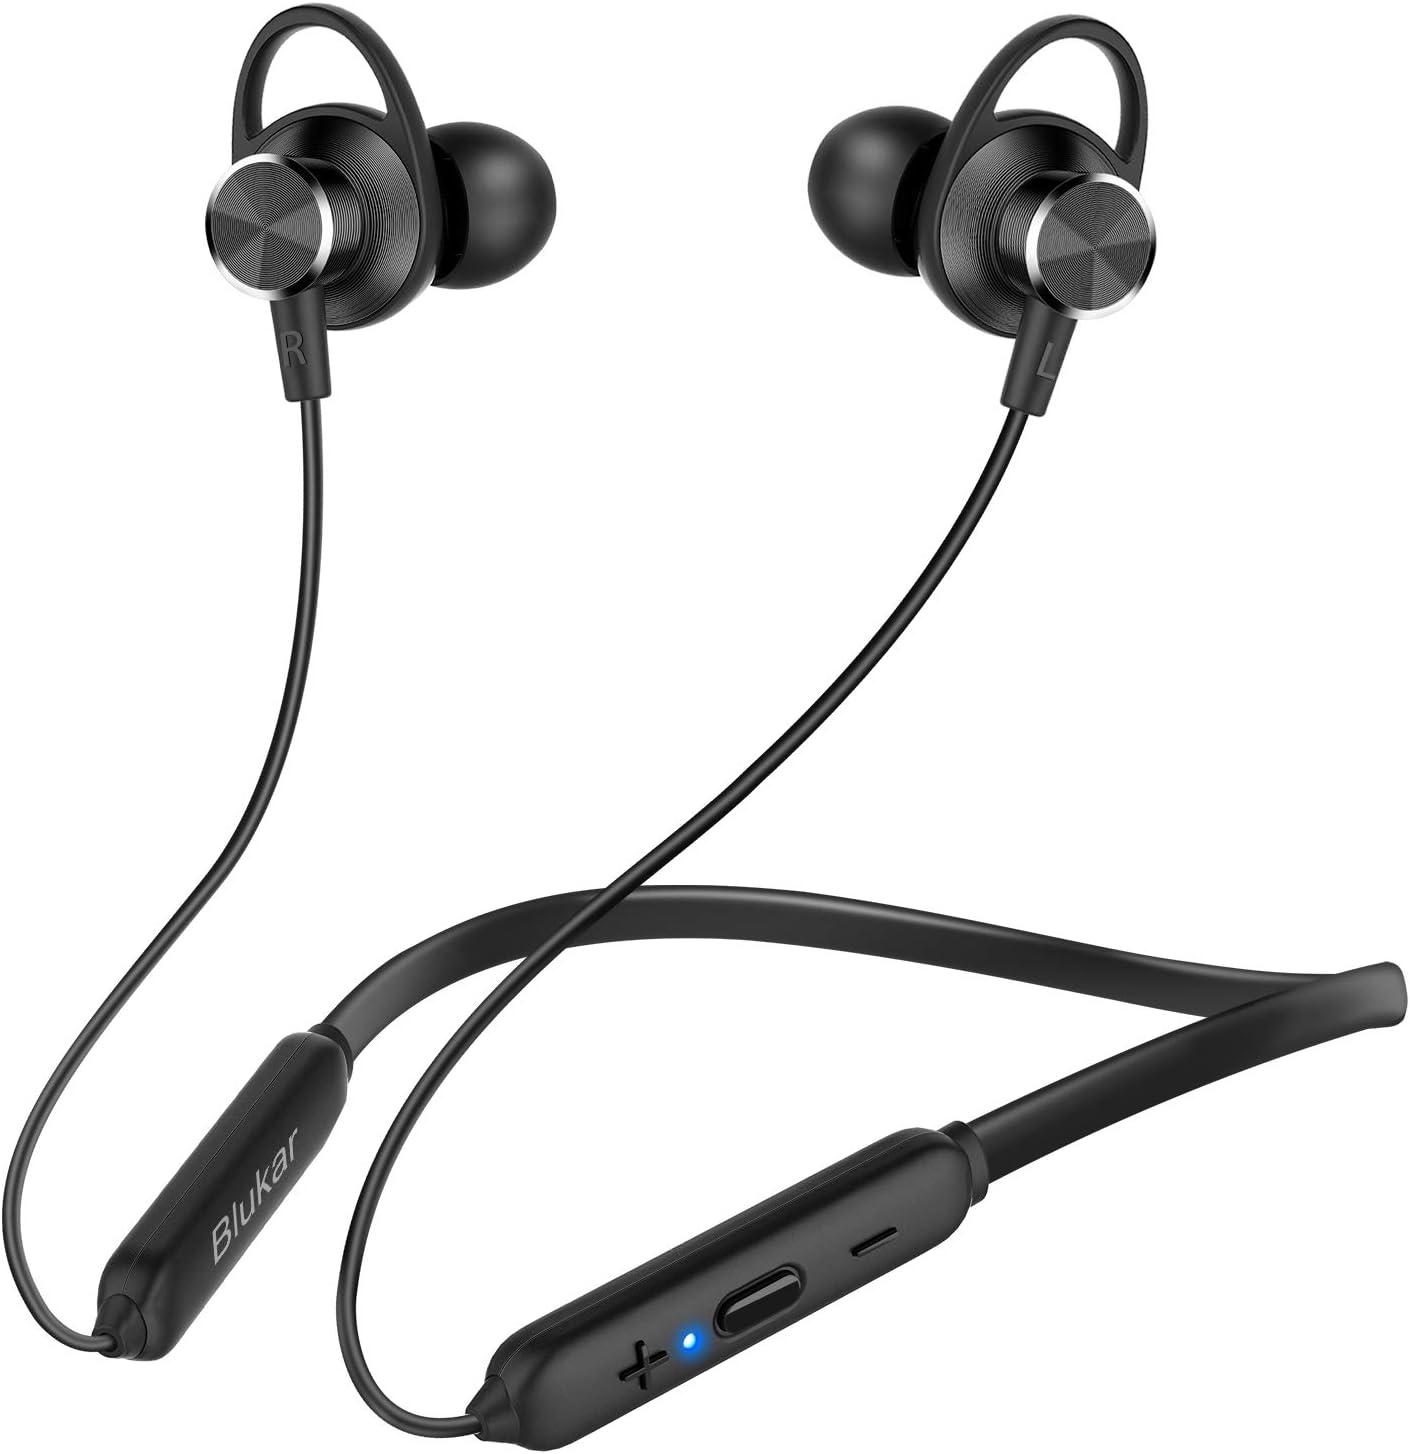 Blukar Auriculares Bluetooth 5.0, Auriculares Inalámbricos Bluetooth Deportivos Magnético In-Ear Estéreo HiFi con Micrófono Anti-Sudor y Cancelación de Ruido Duración 10H para iOS Android